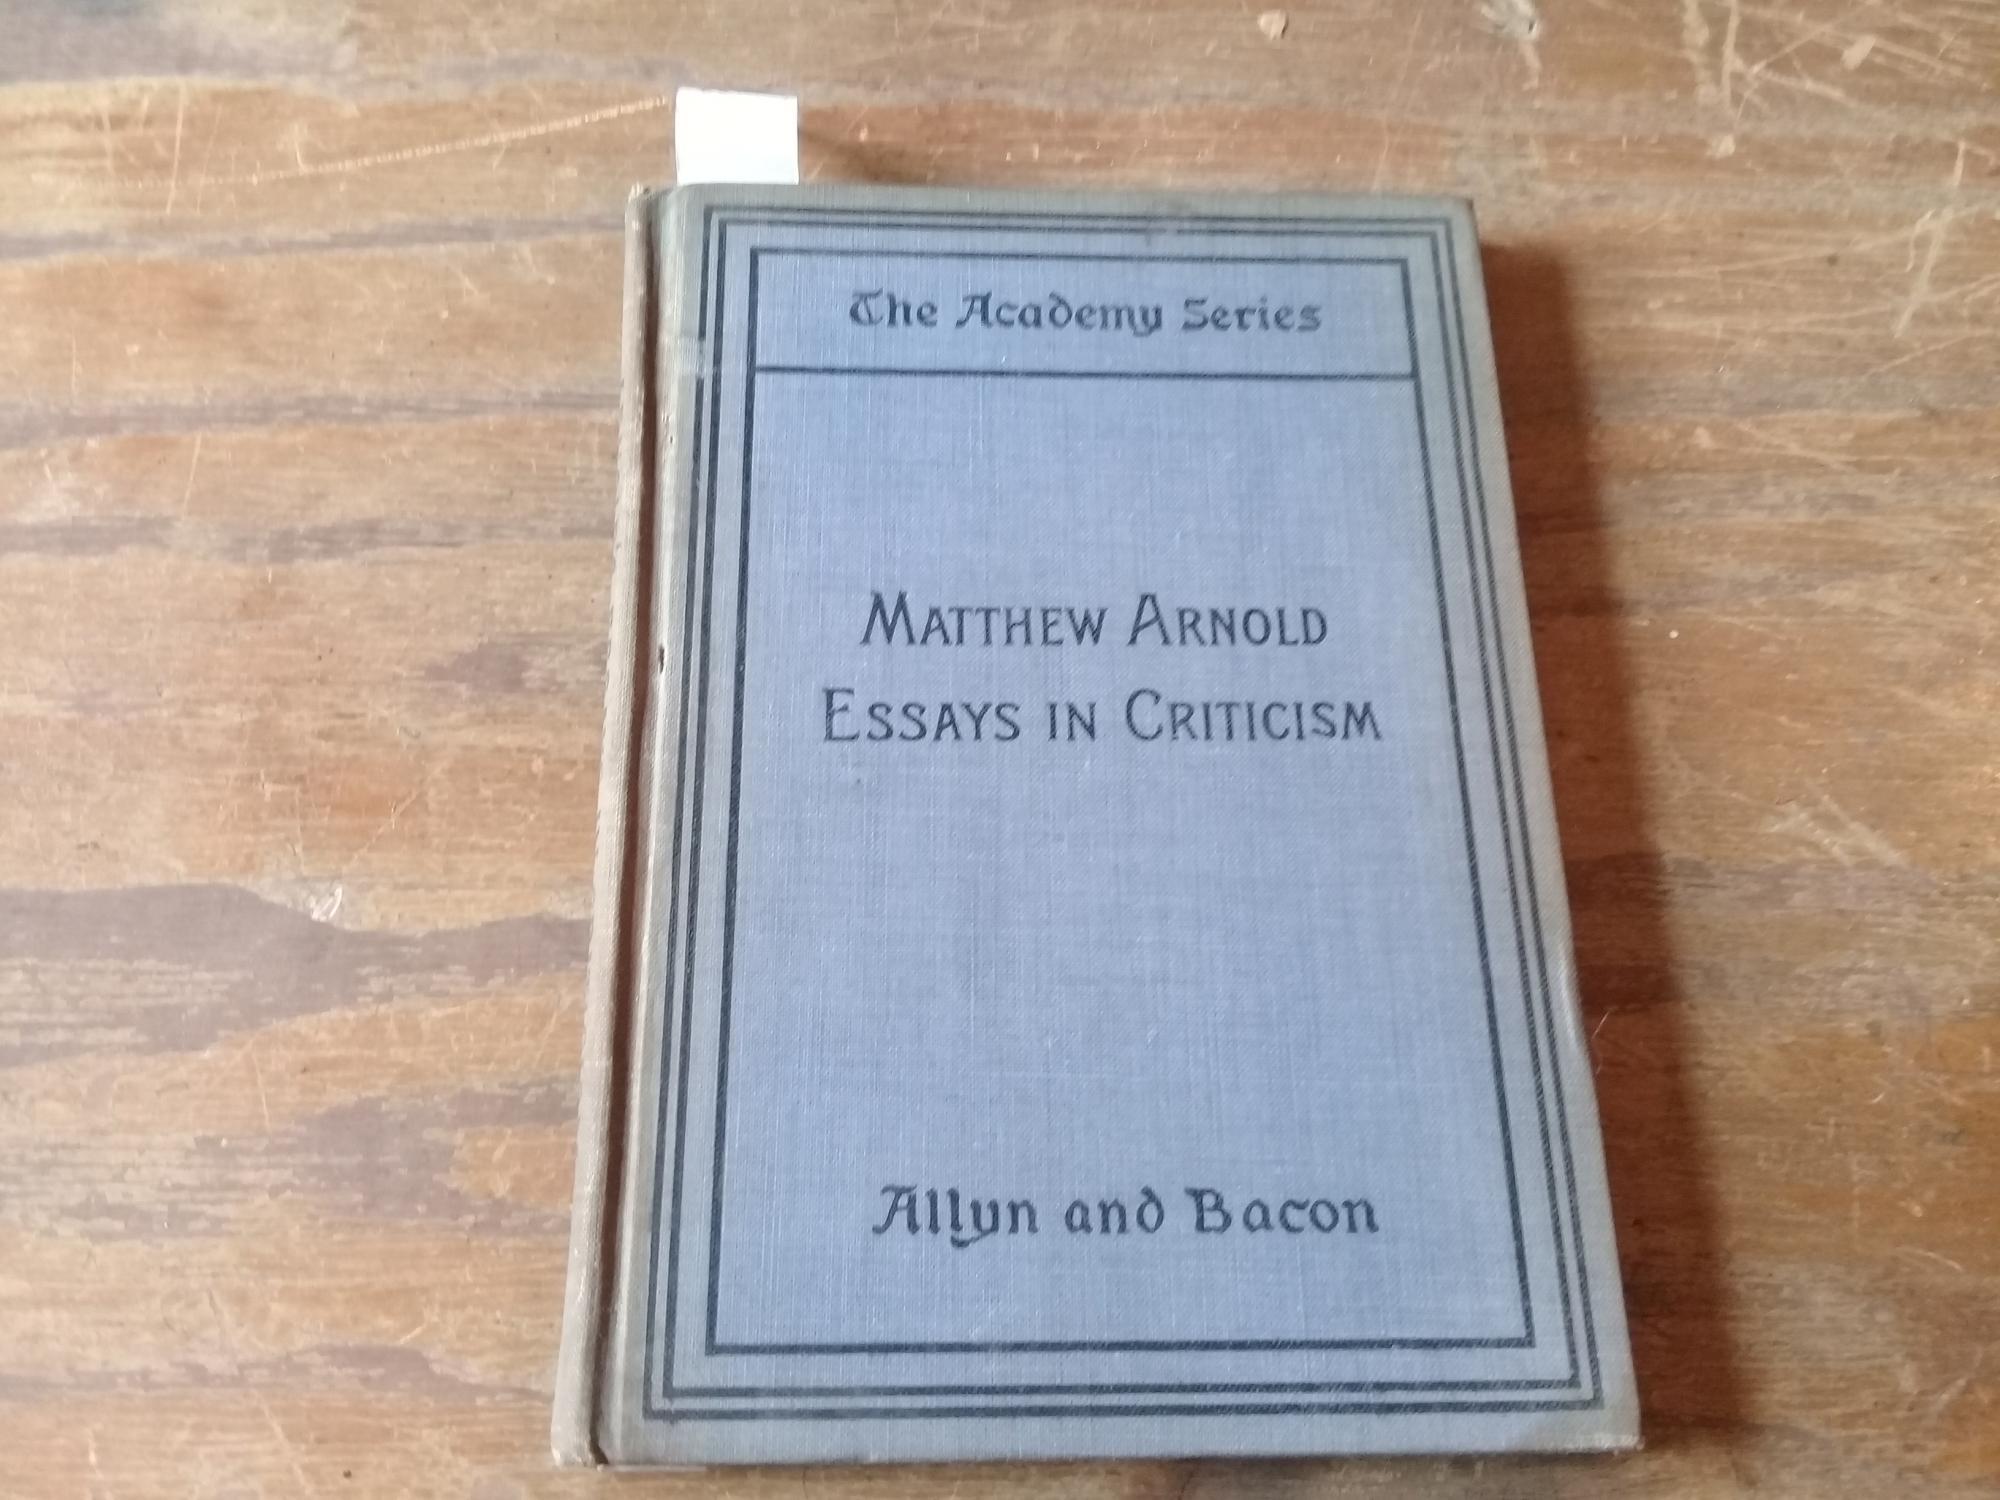 Matthew arnold essay on john keats good topic for essay argument